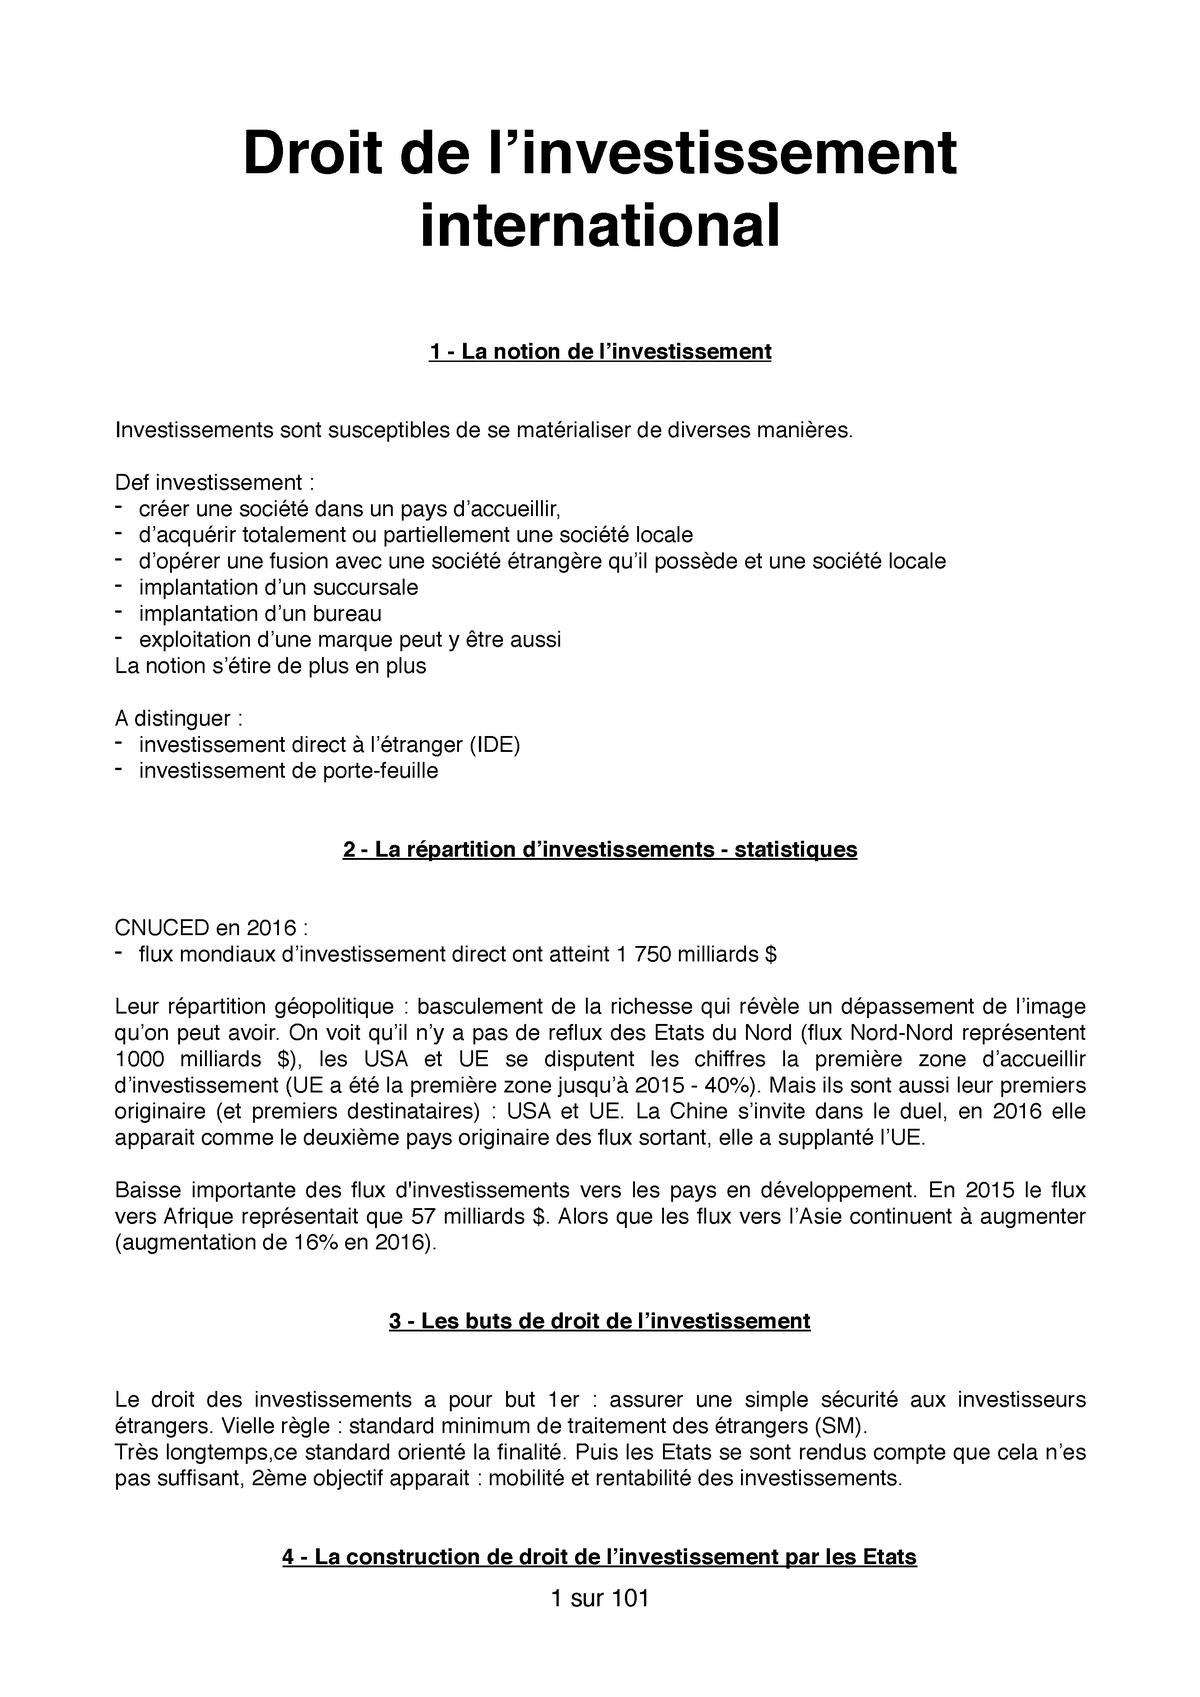 Cm Droit De L Investissement Inernational Studocu